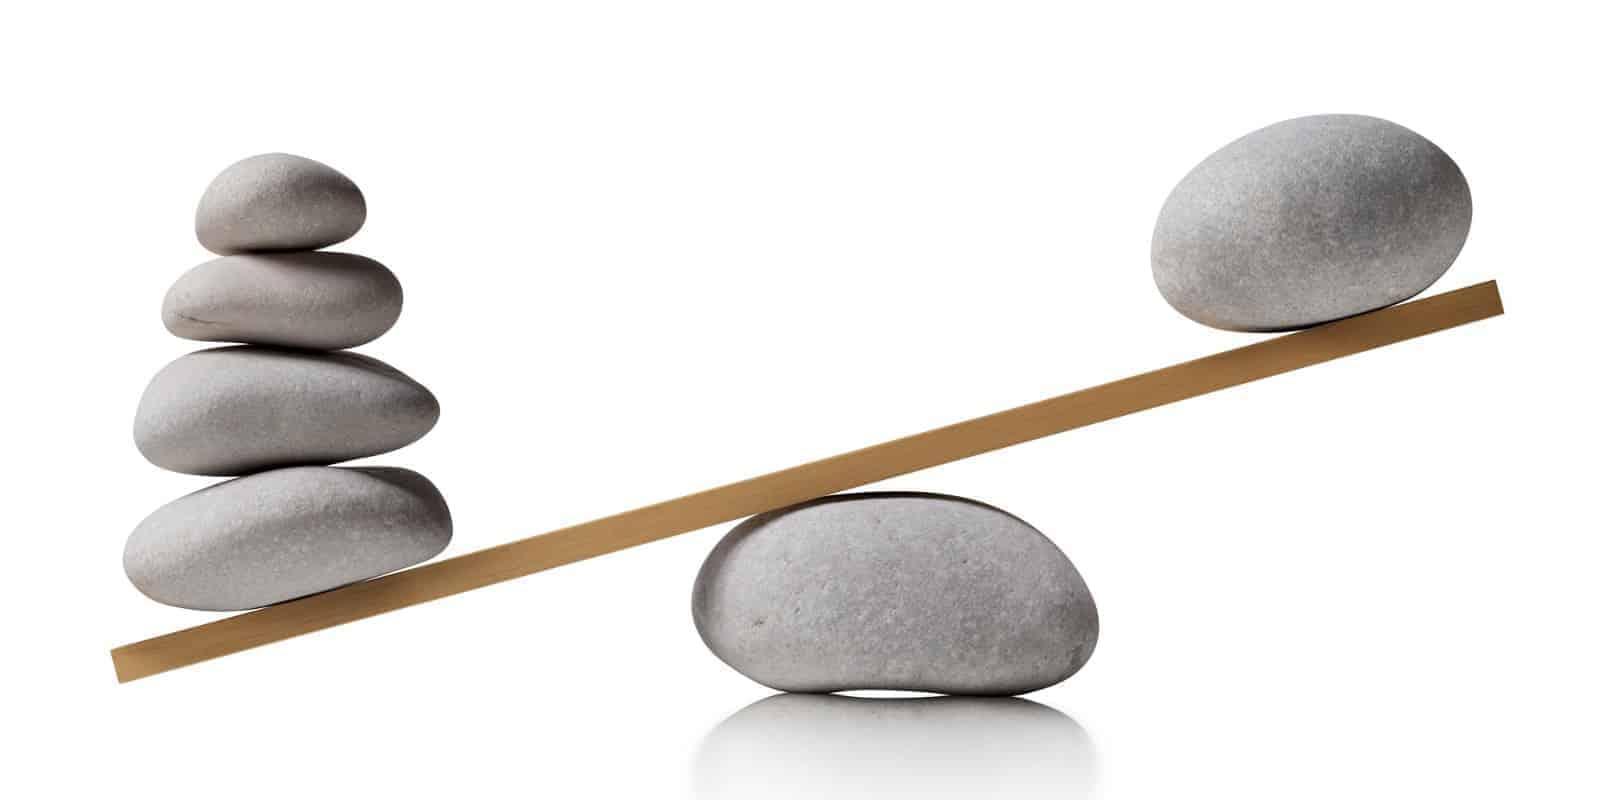 accountability vs. responsibility find balance